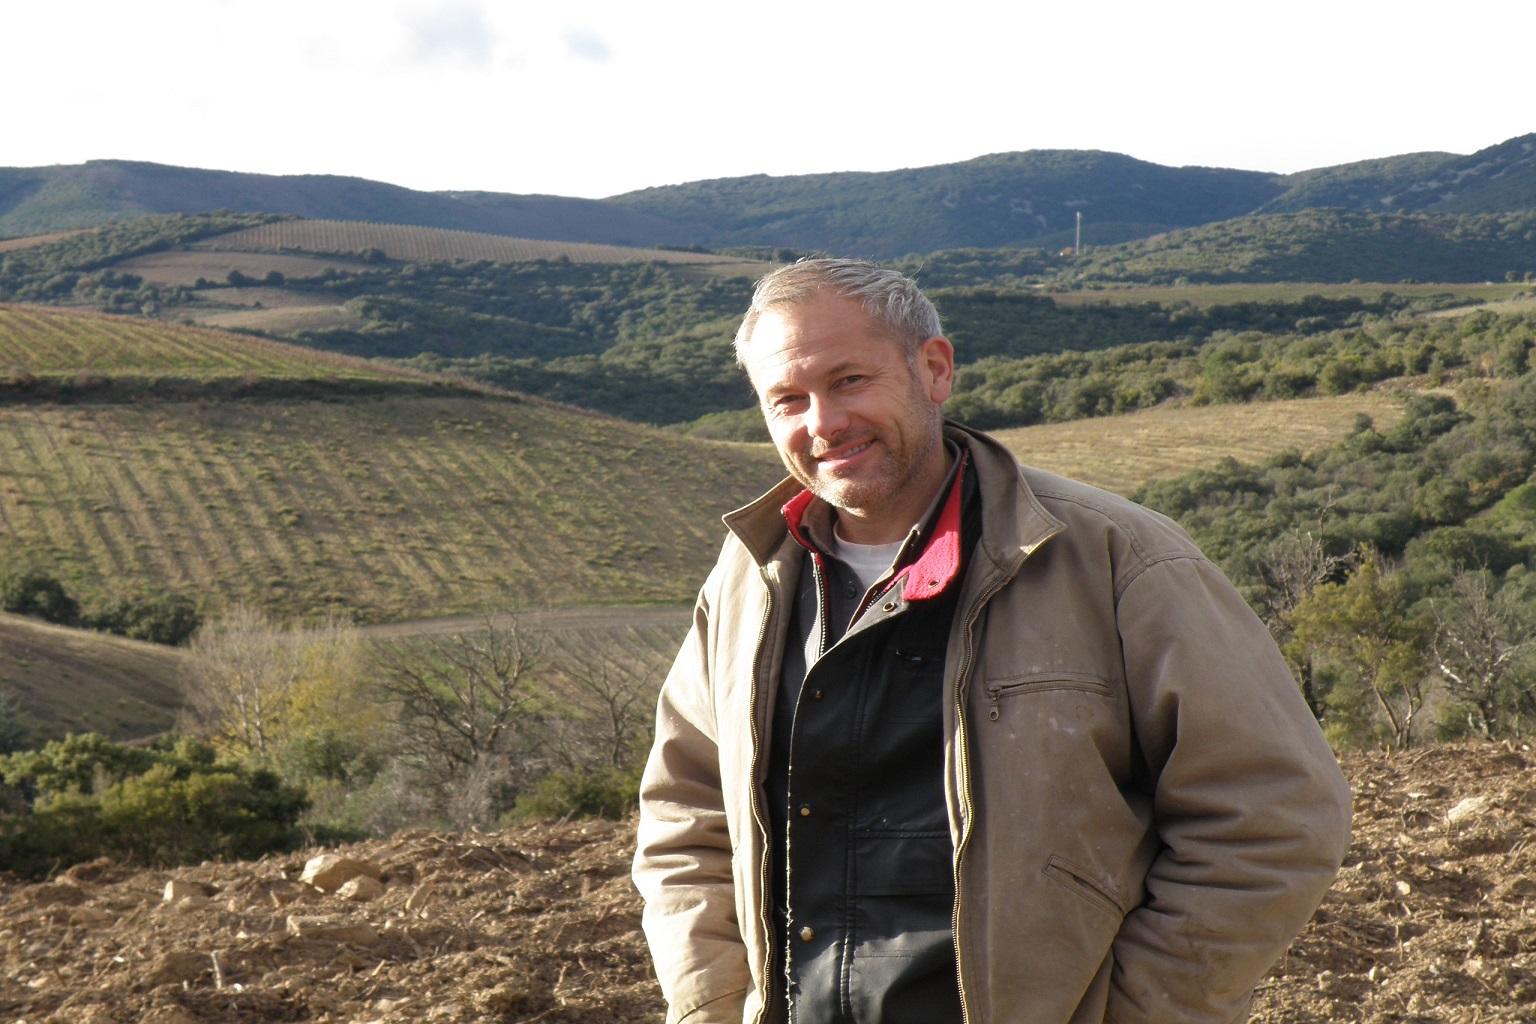 Domaine Léon Barral - アペロ ワインバー オーガニックワインxフランス家庭料理 - 東京都港区南青山3-4-6 / apéro WINEBAR - vins et petits plats français